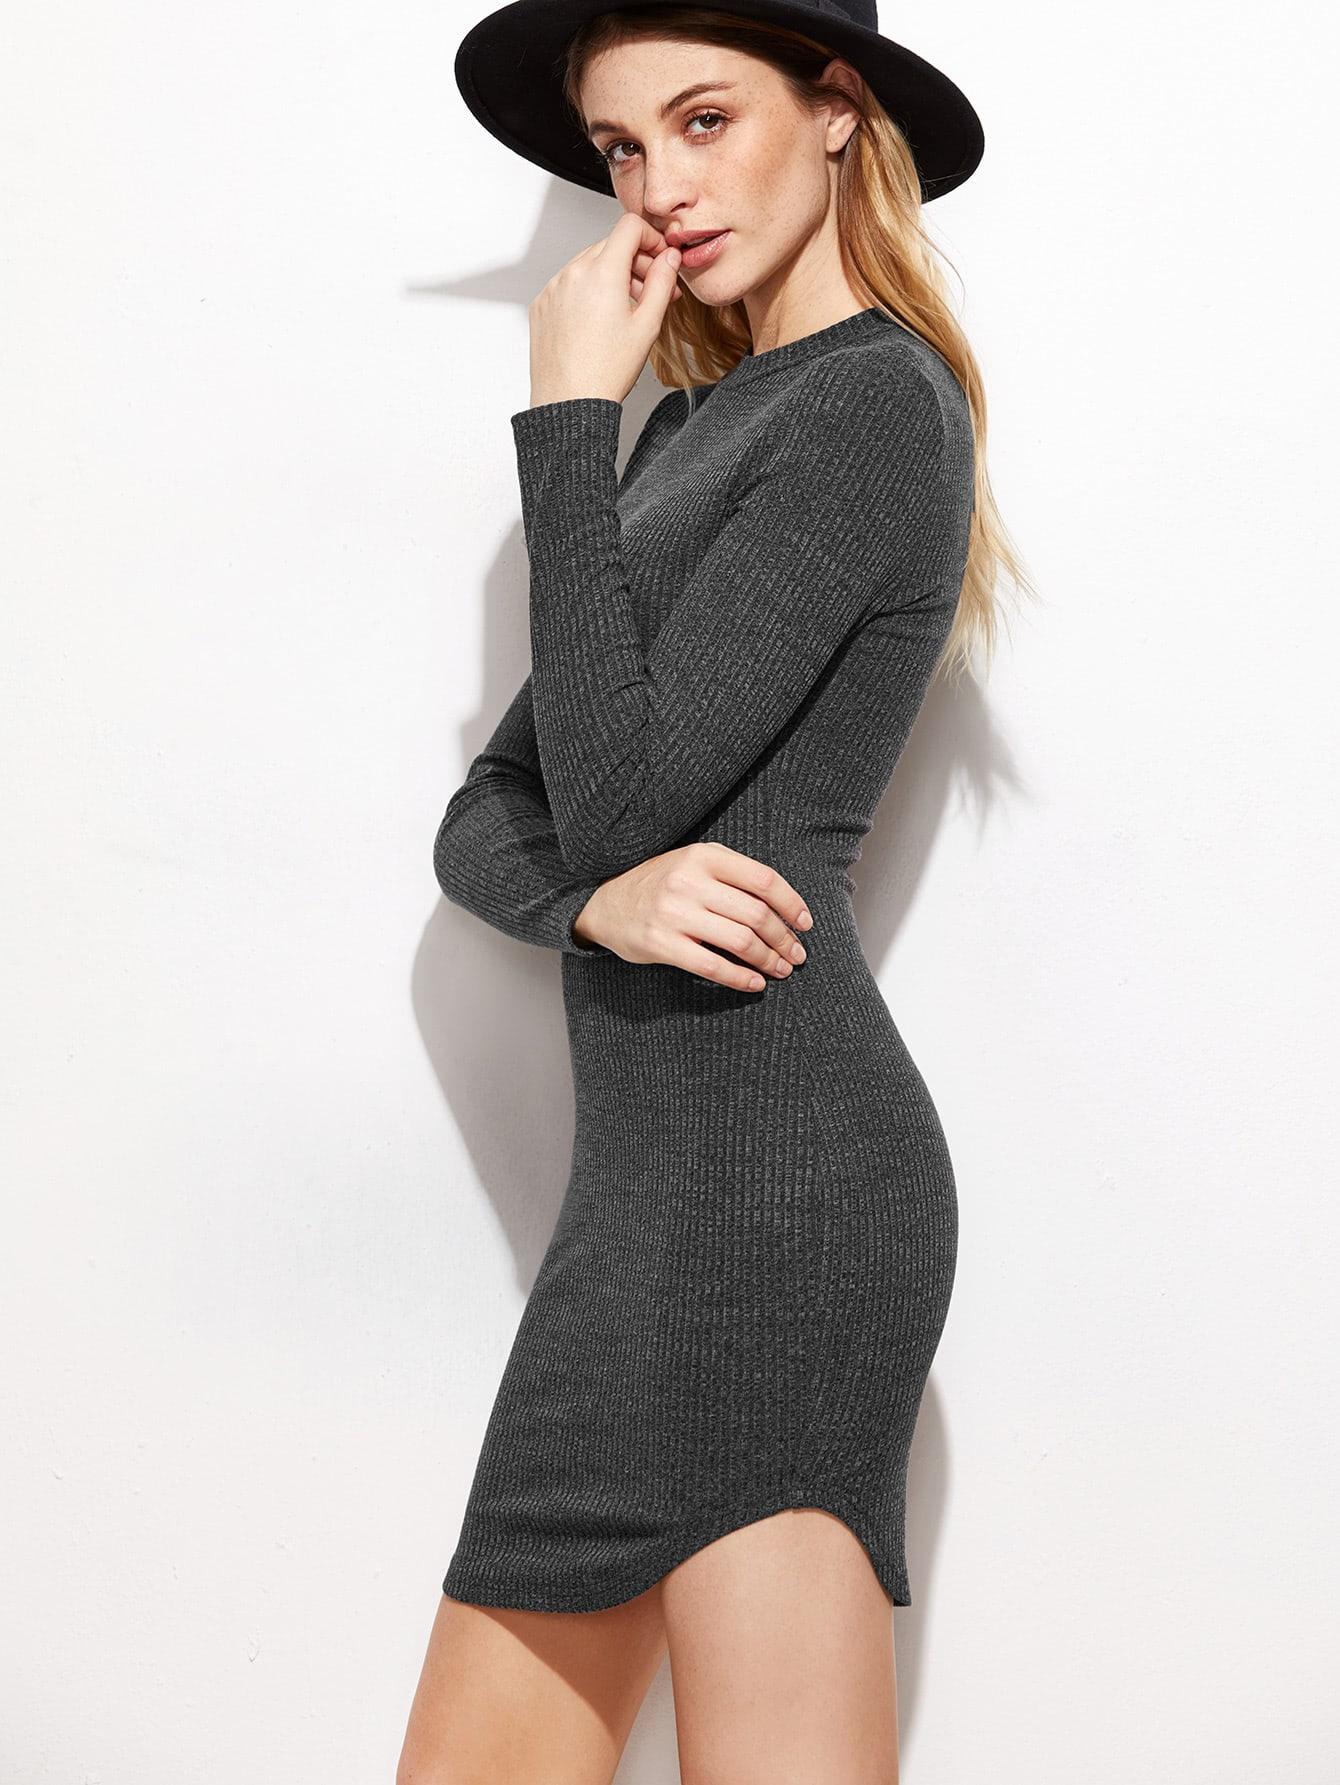 Ribbed Knit Curved Hem Bodycon Dress dress161028703